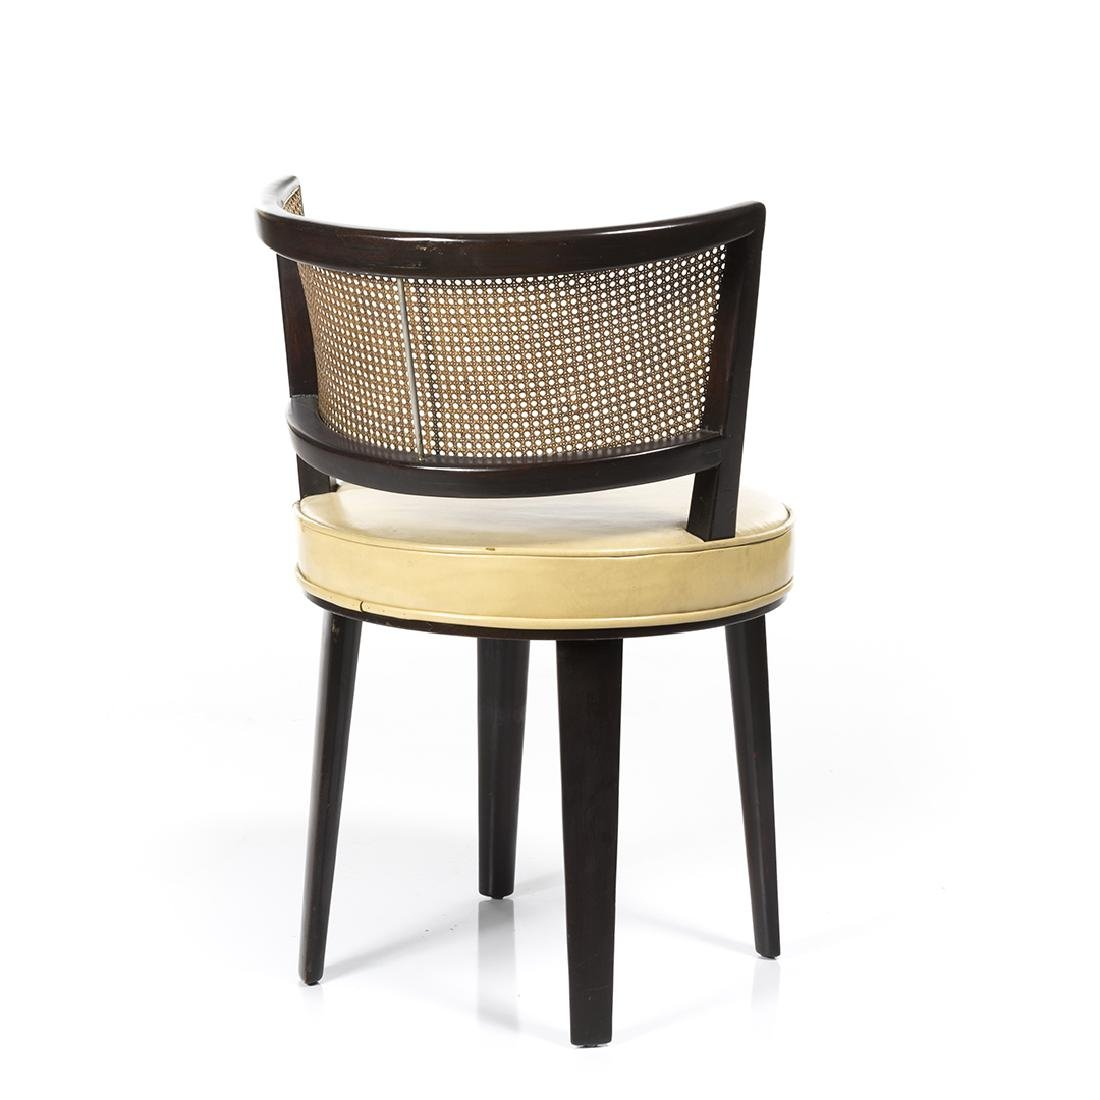 Dunbar Mahogany Chair - 3